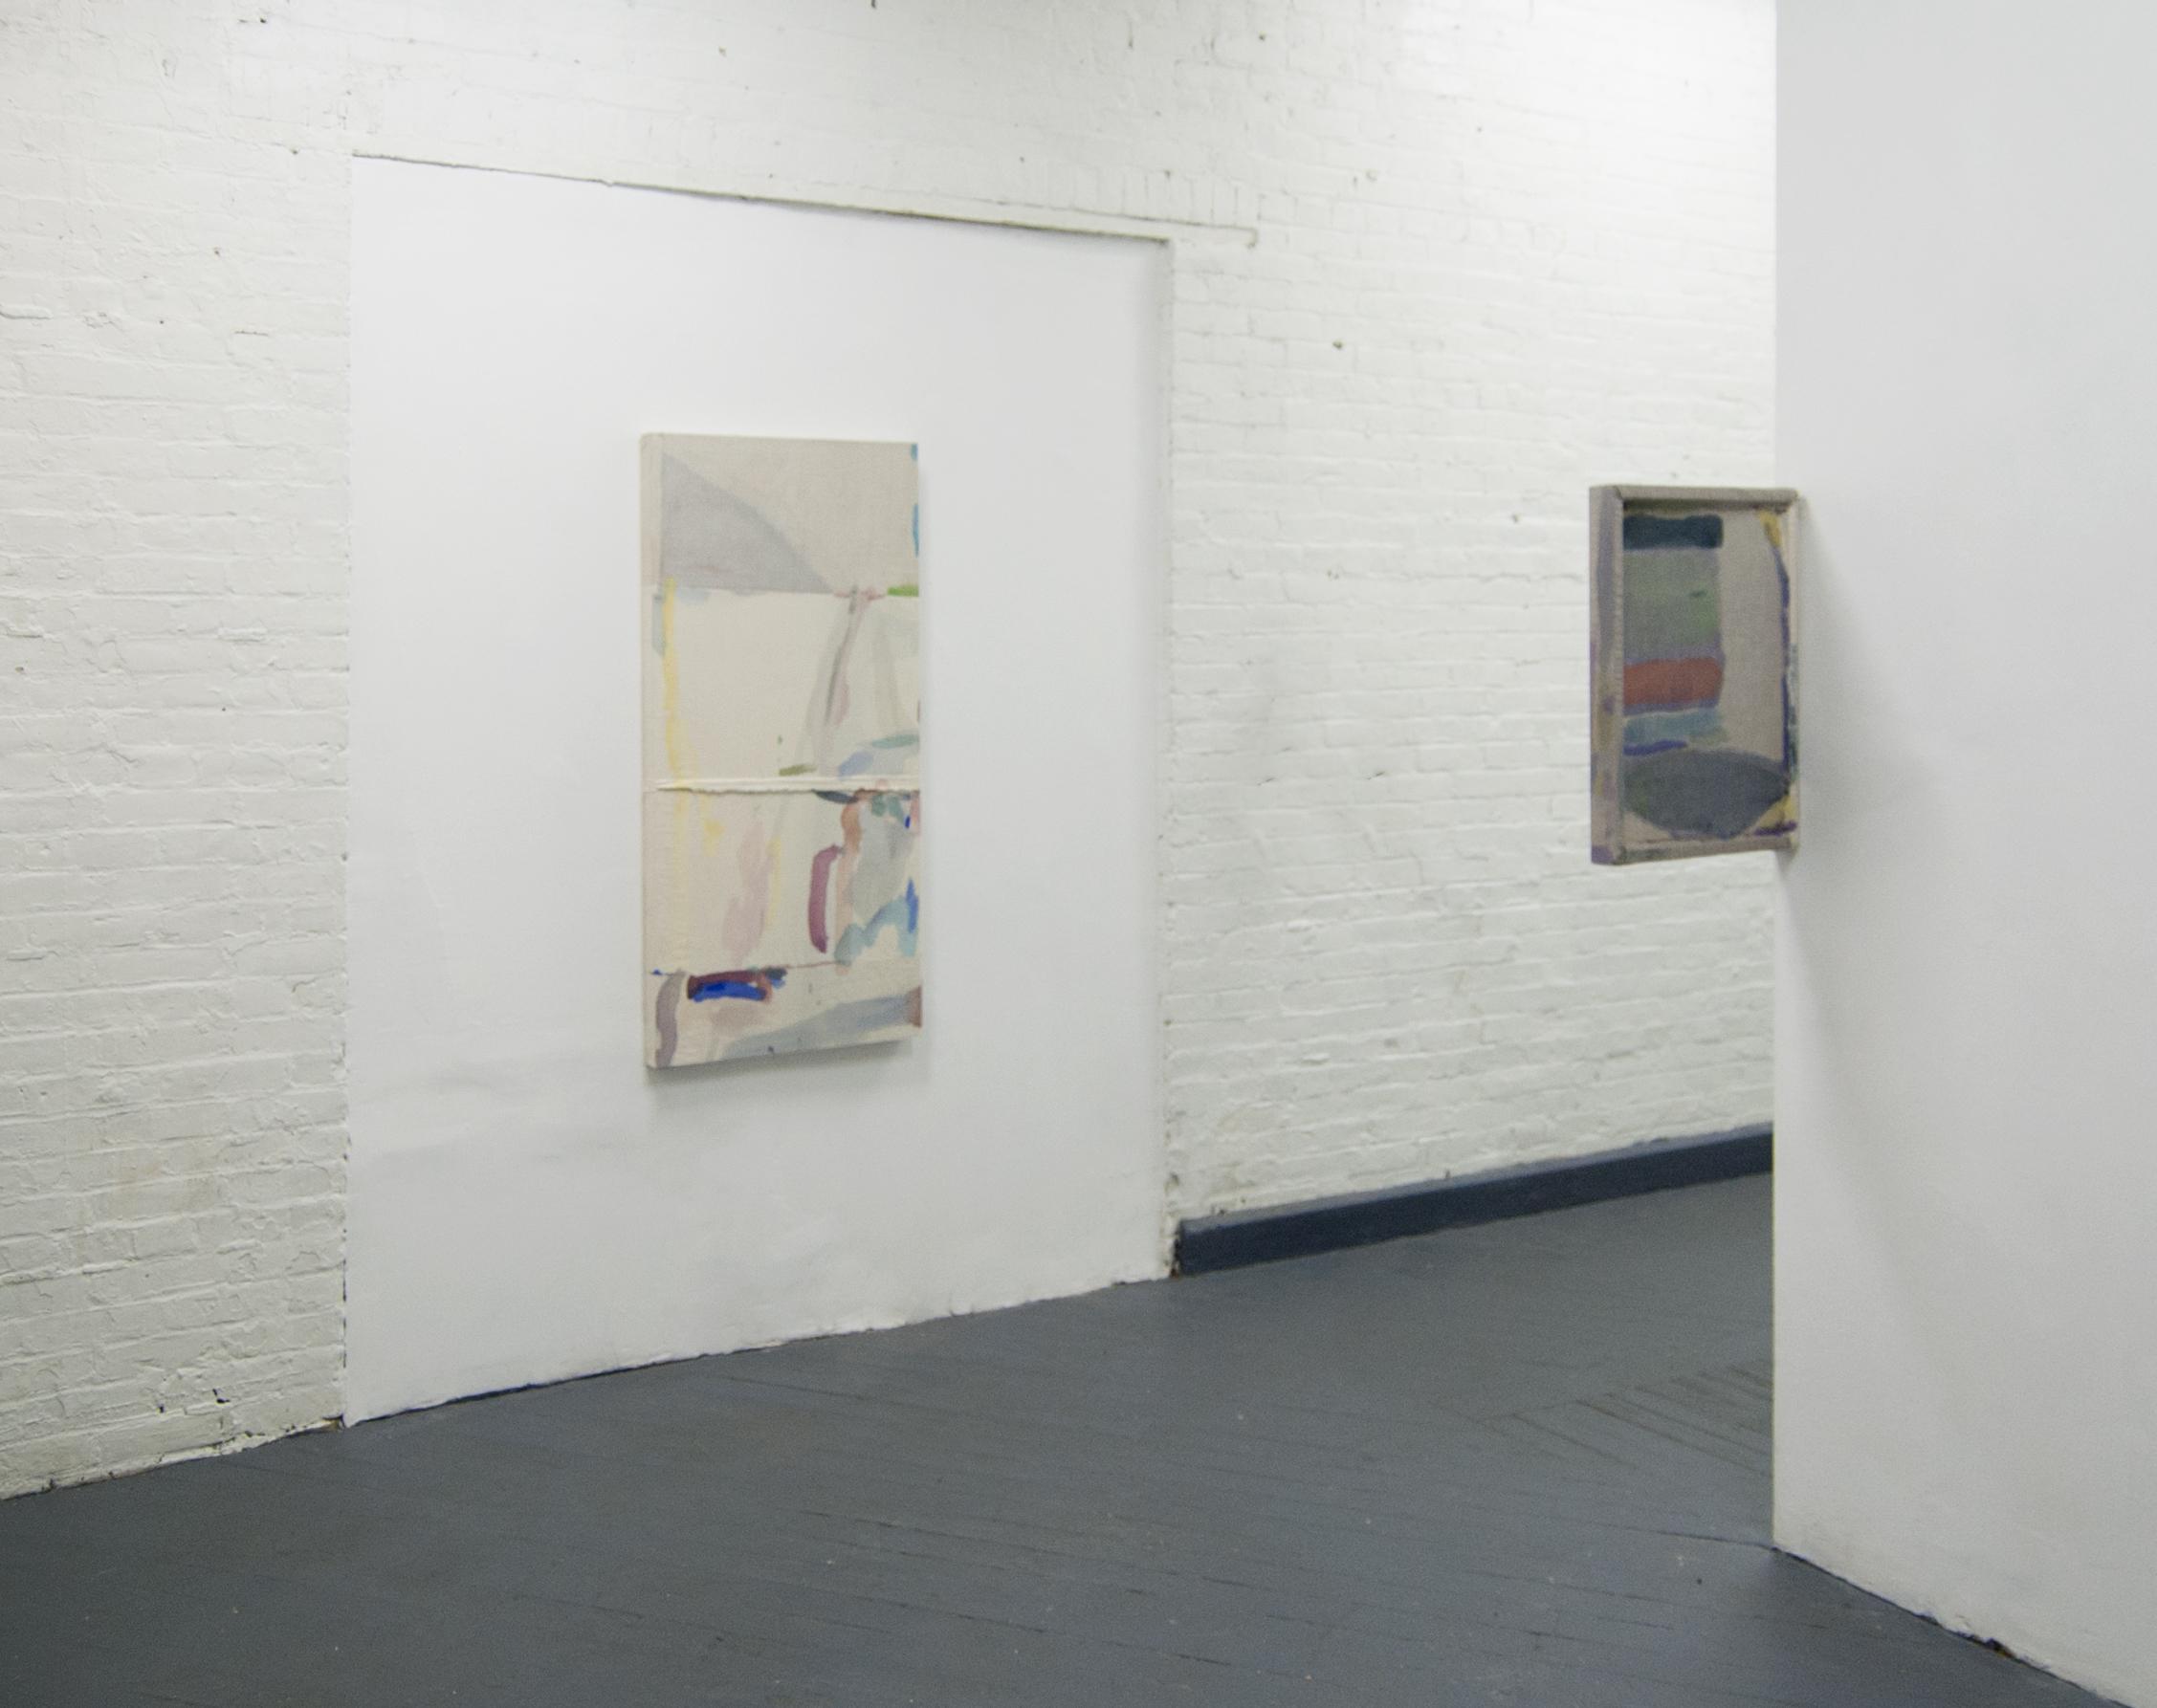 Darkroom Exhibition View at Ballroom gallery in Baltimore